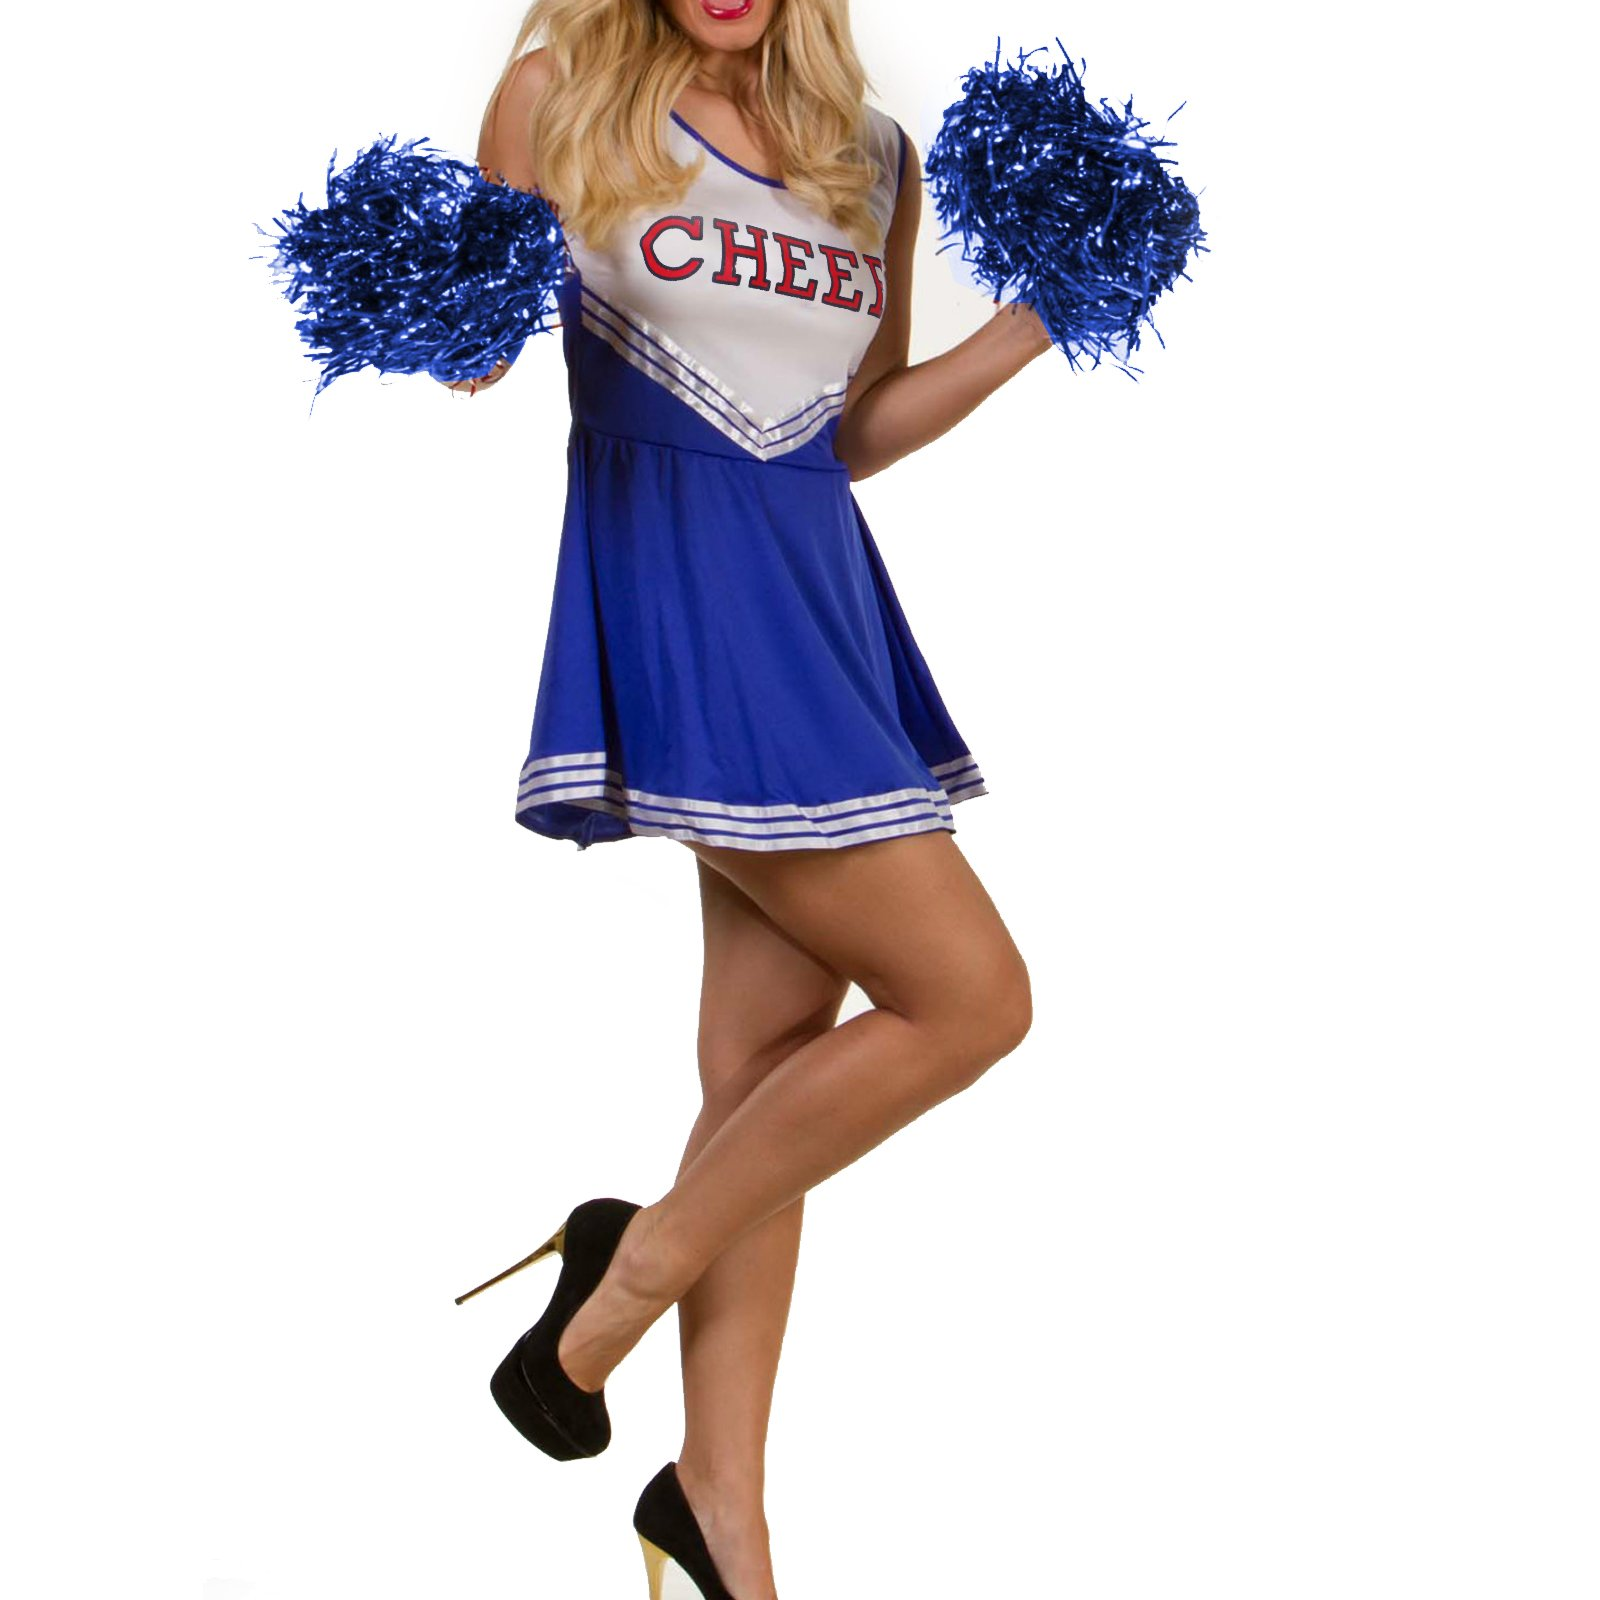 Fancy Dress Cheerleader Accessory Usa White /& Blue Cheerleader/'s Pom Pom Red